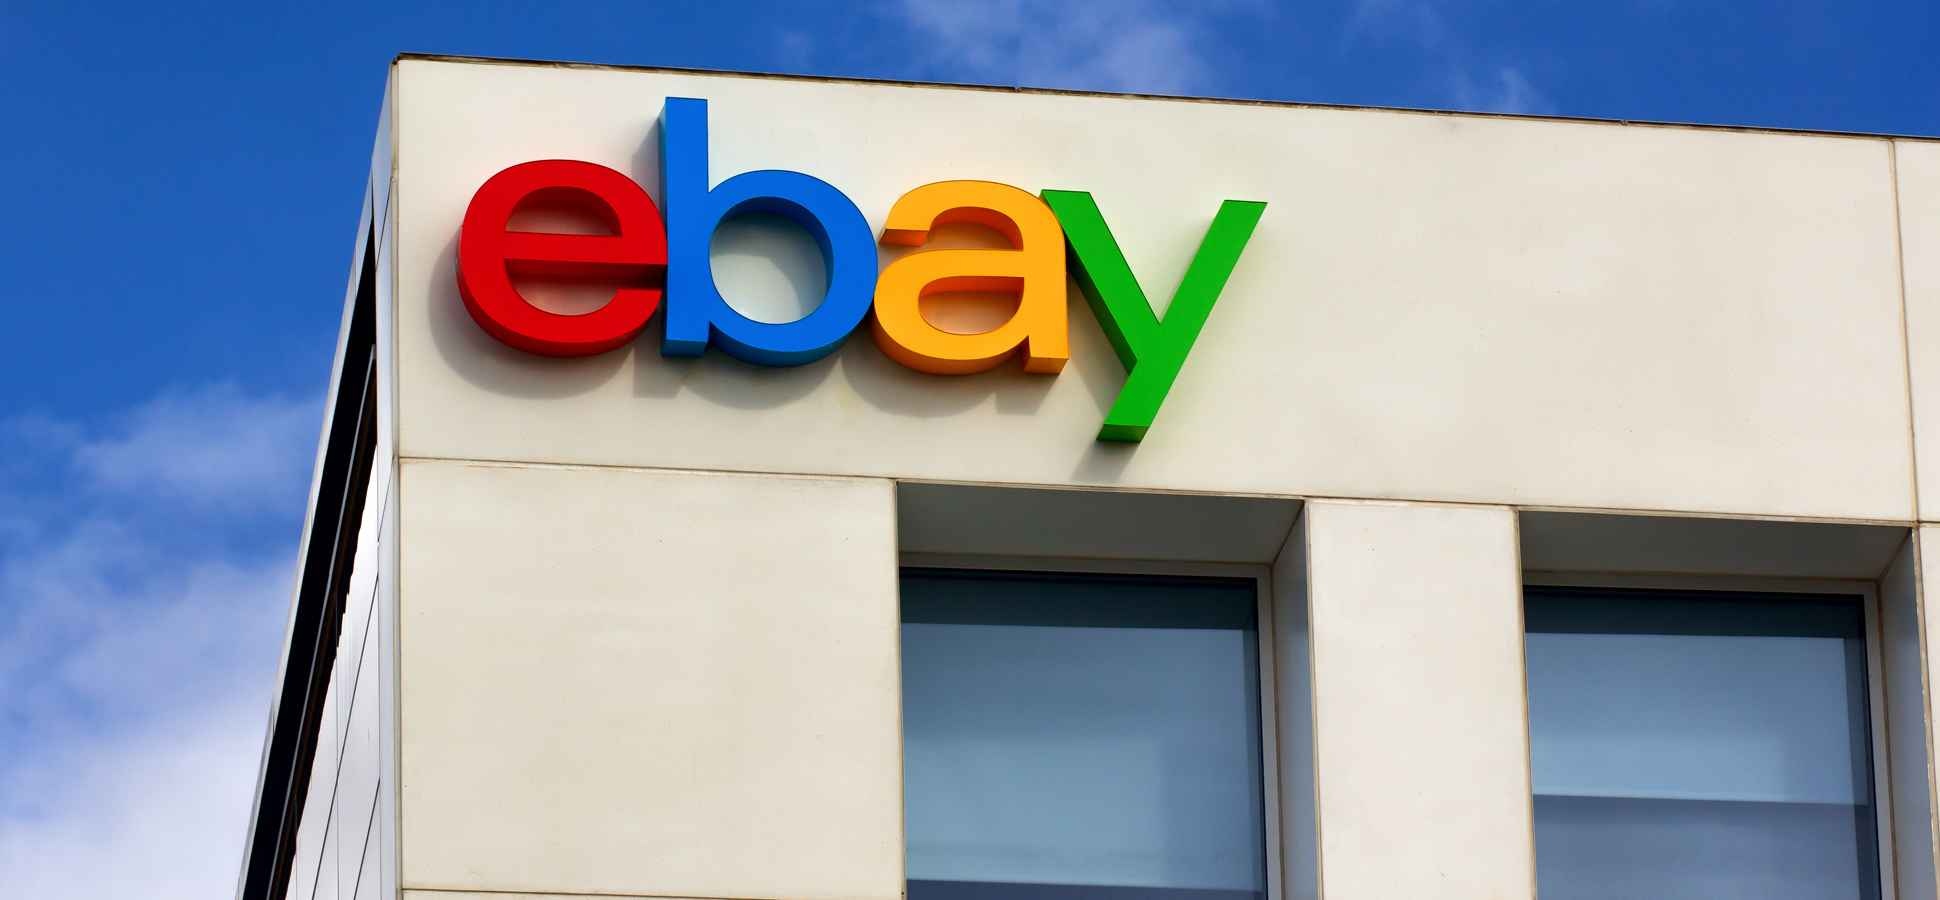 EBay Sells Stake Back to Craigslist